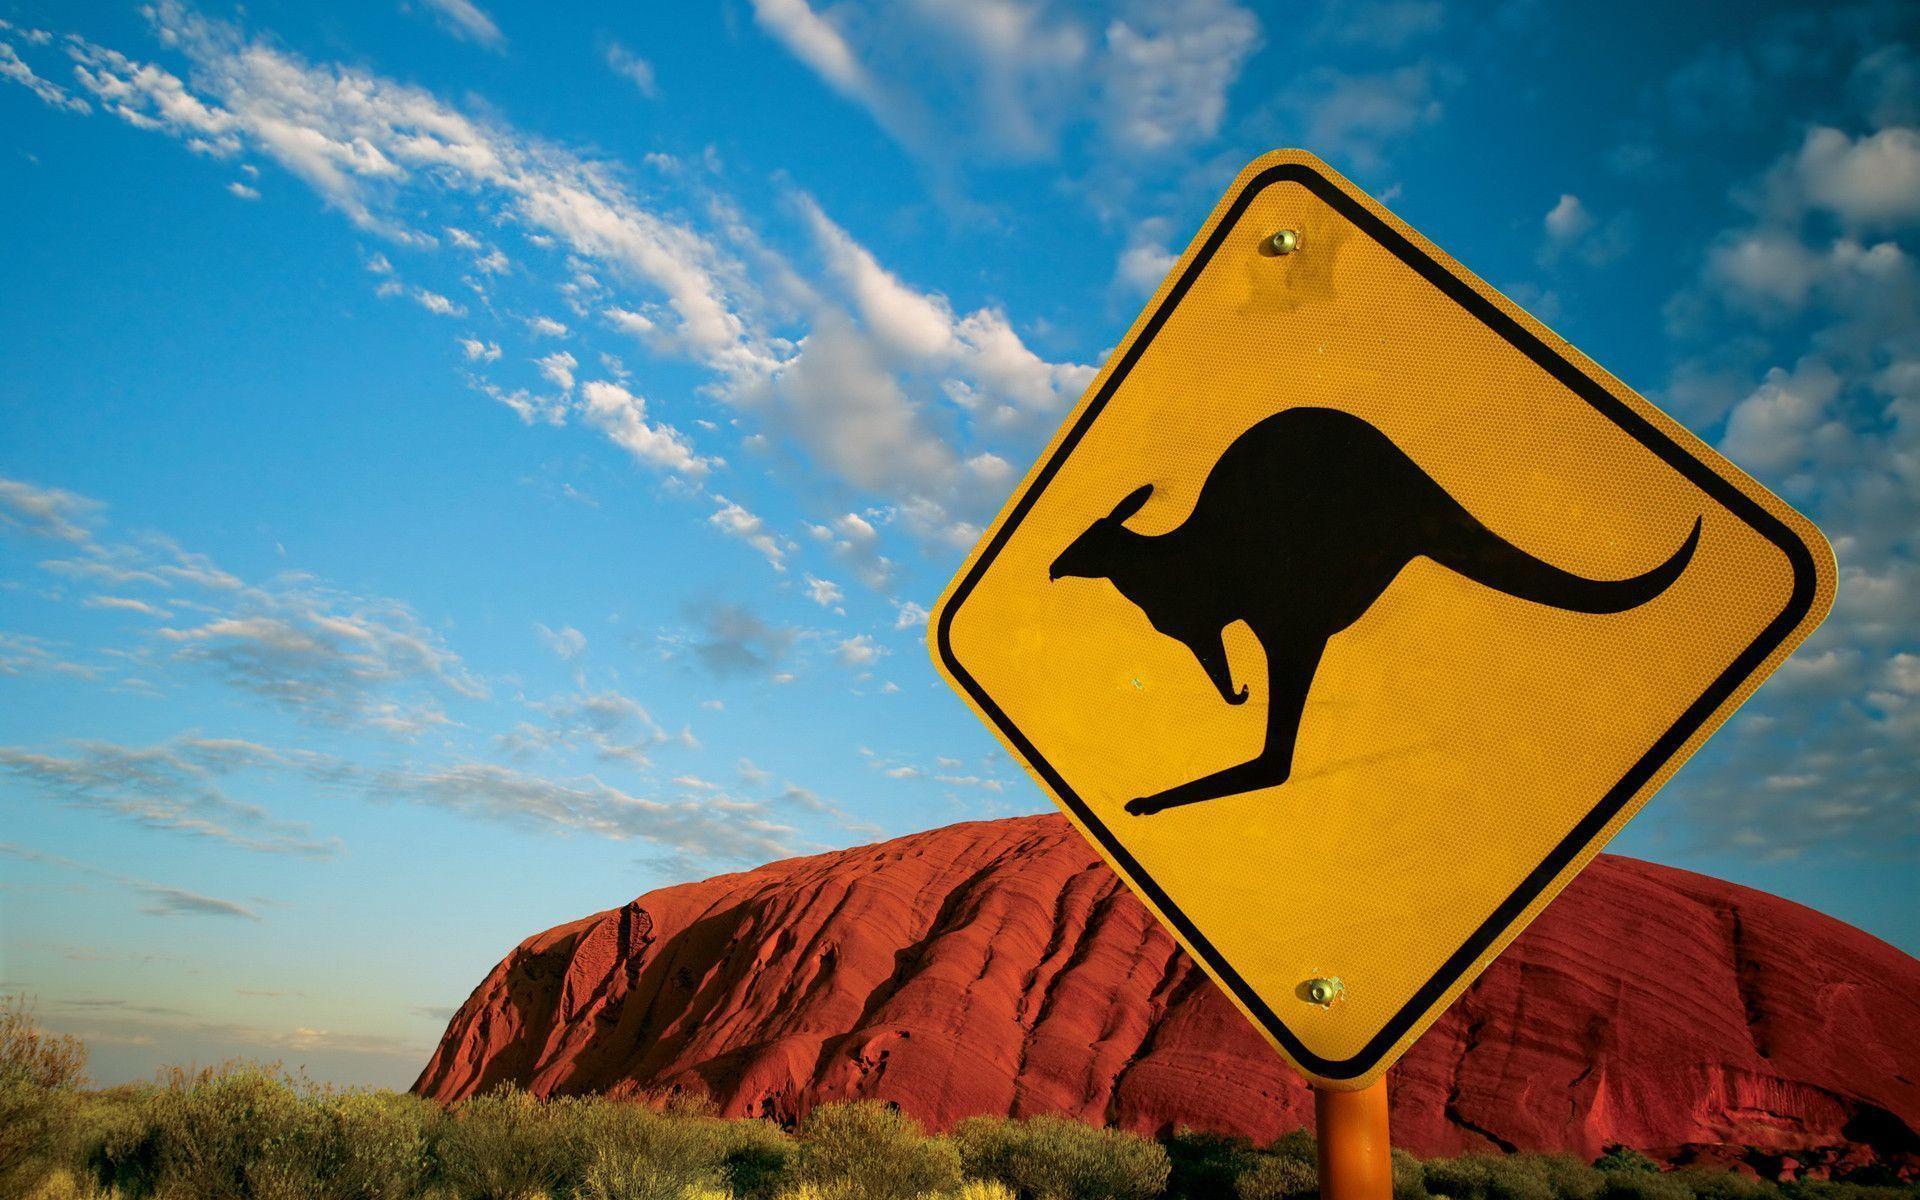 Kangaroo Wallpapers - Full HD wallpaper search